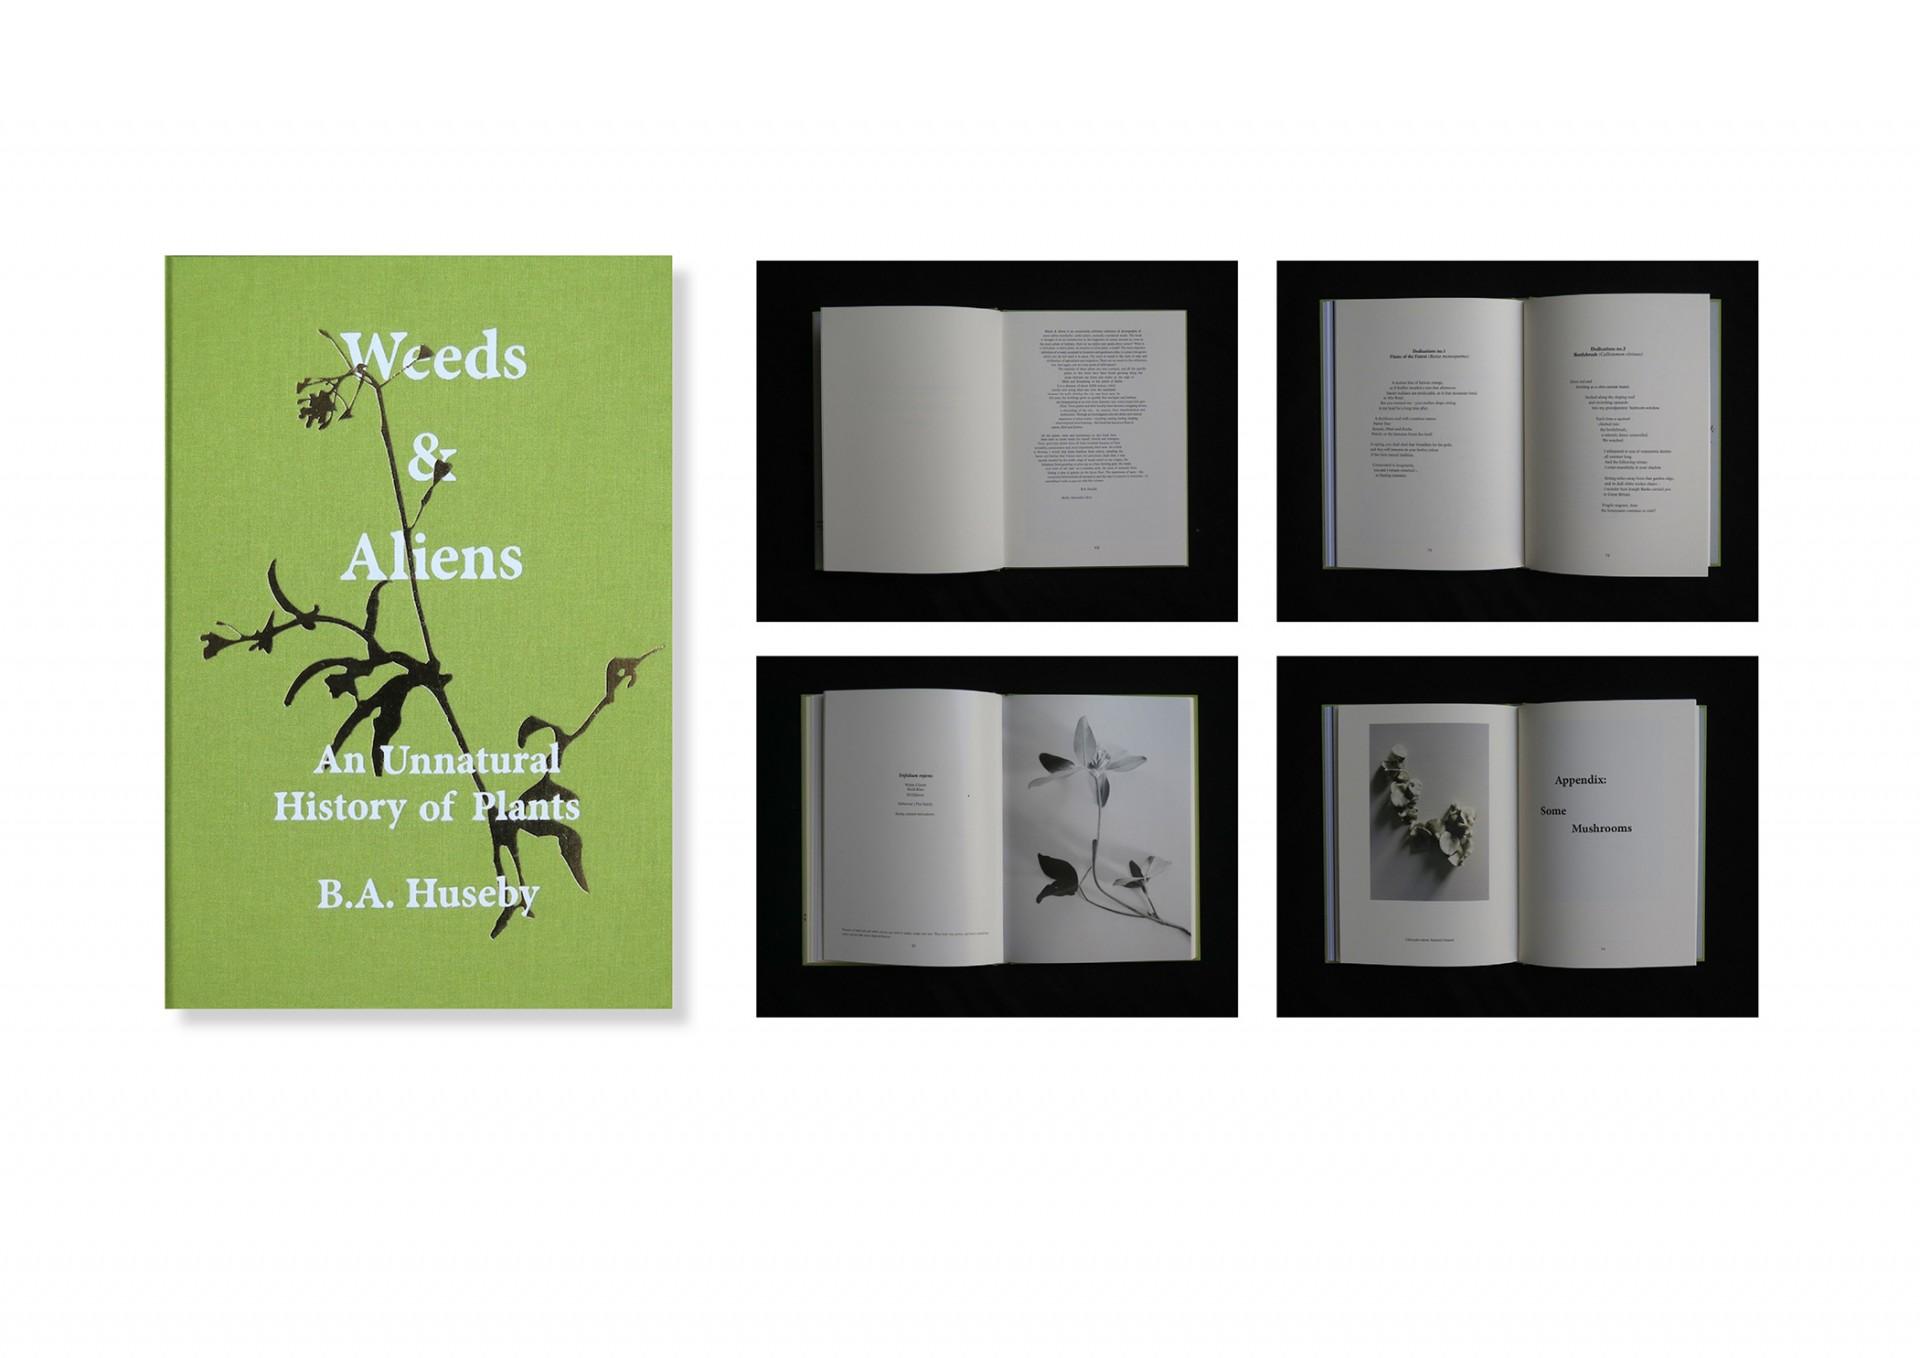 Rupert Smyth Studio Weeds & Aliens